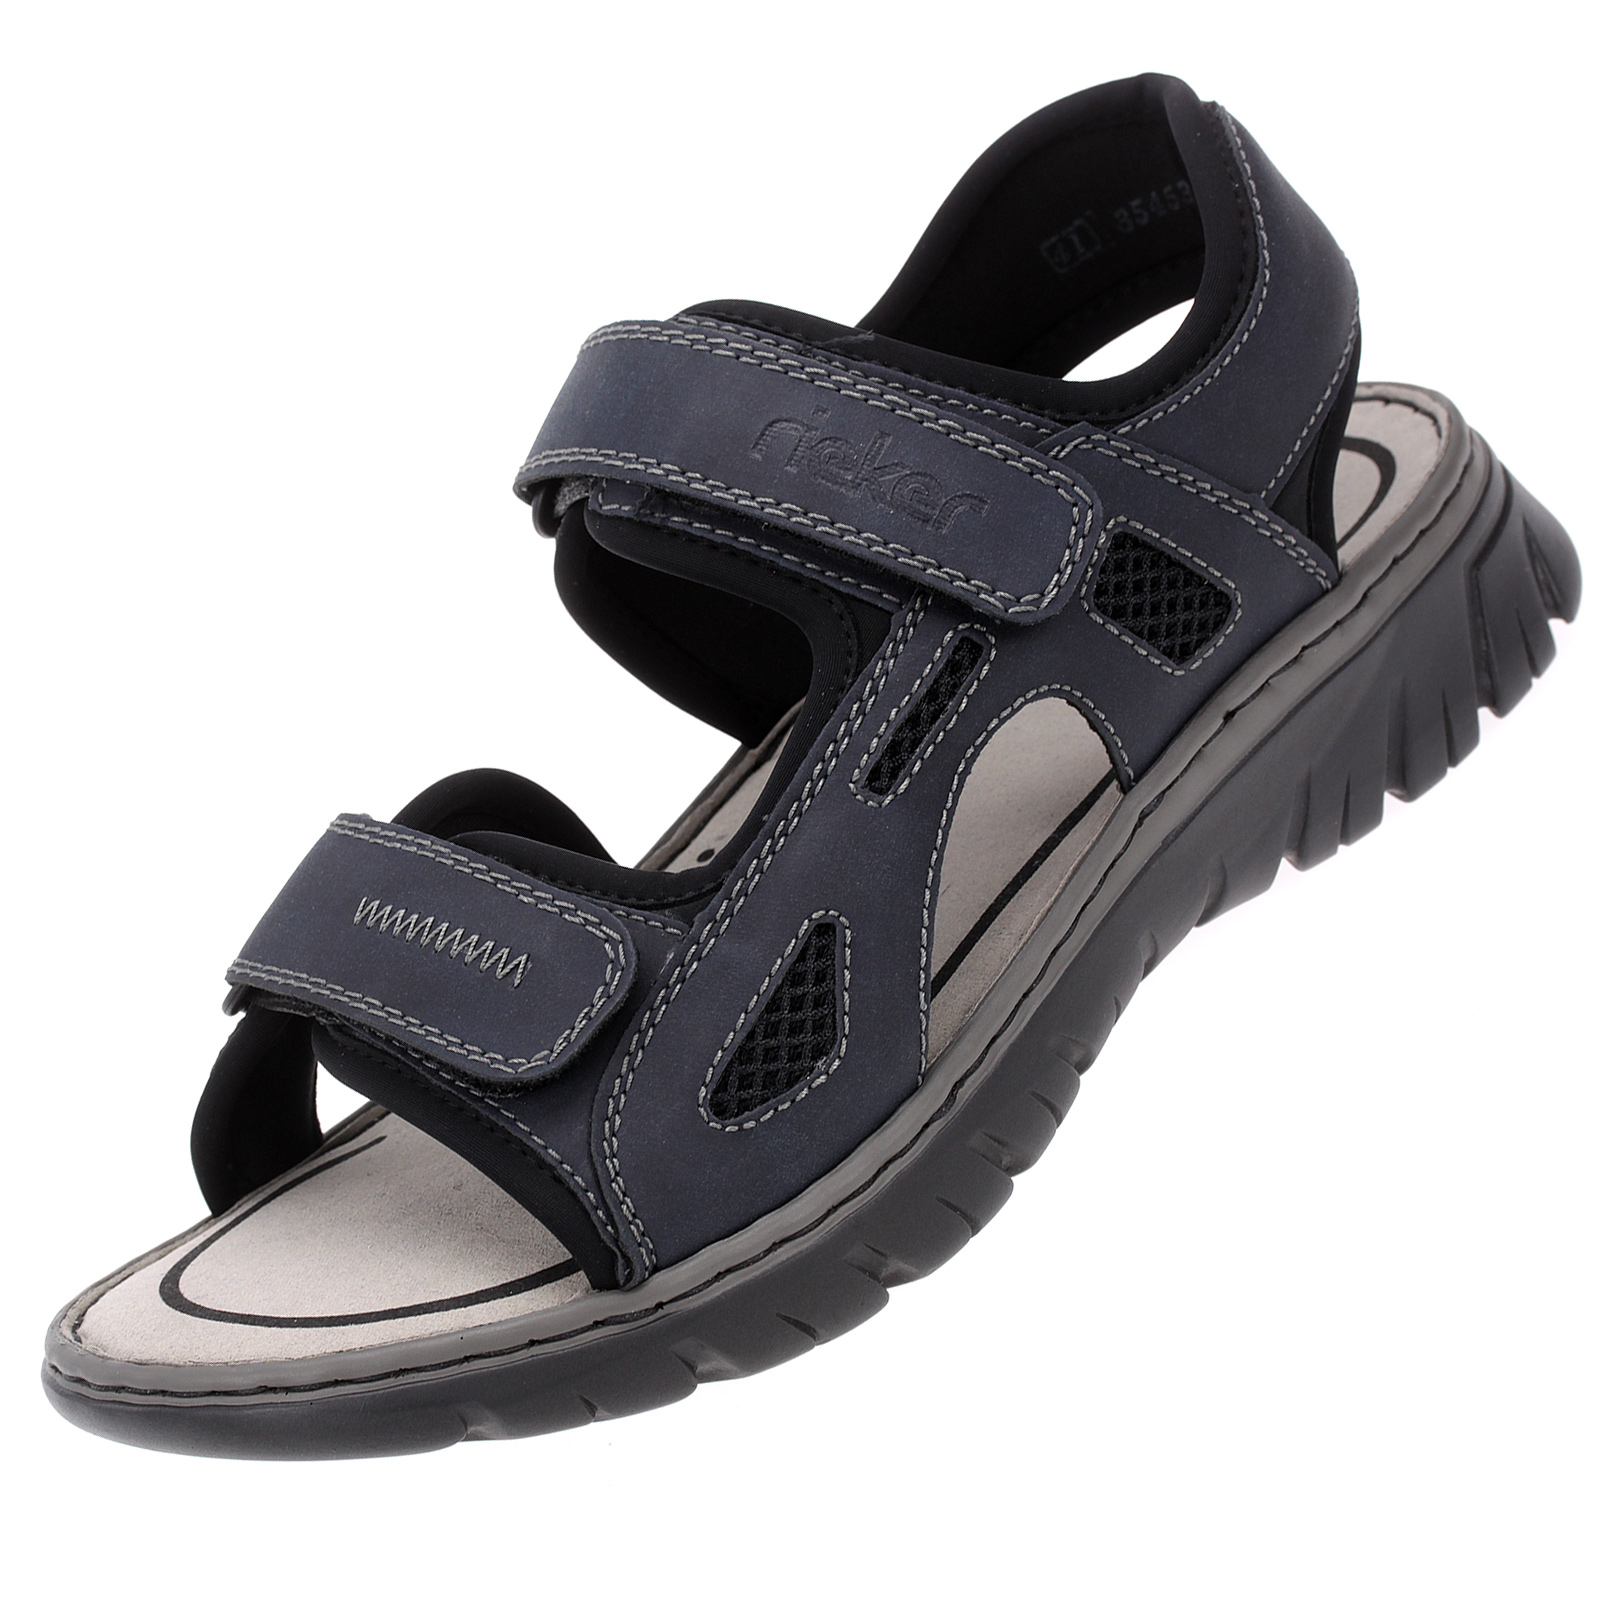 Rieker Herren Sandalen Trekking-Sandale Outdoor Sommerschuhe Schuhe 26761-14